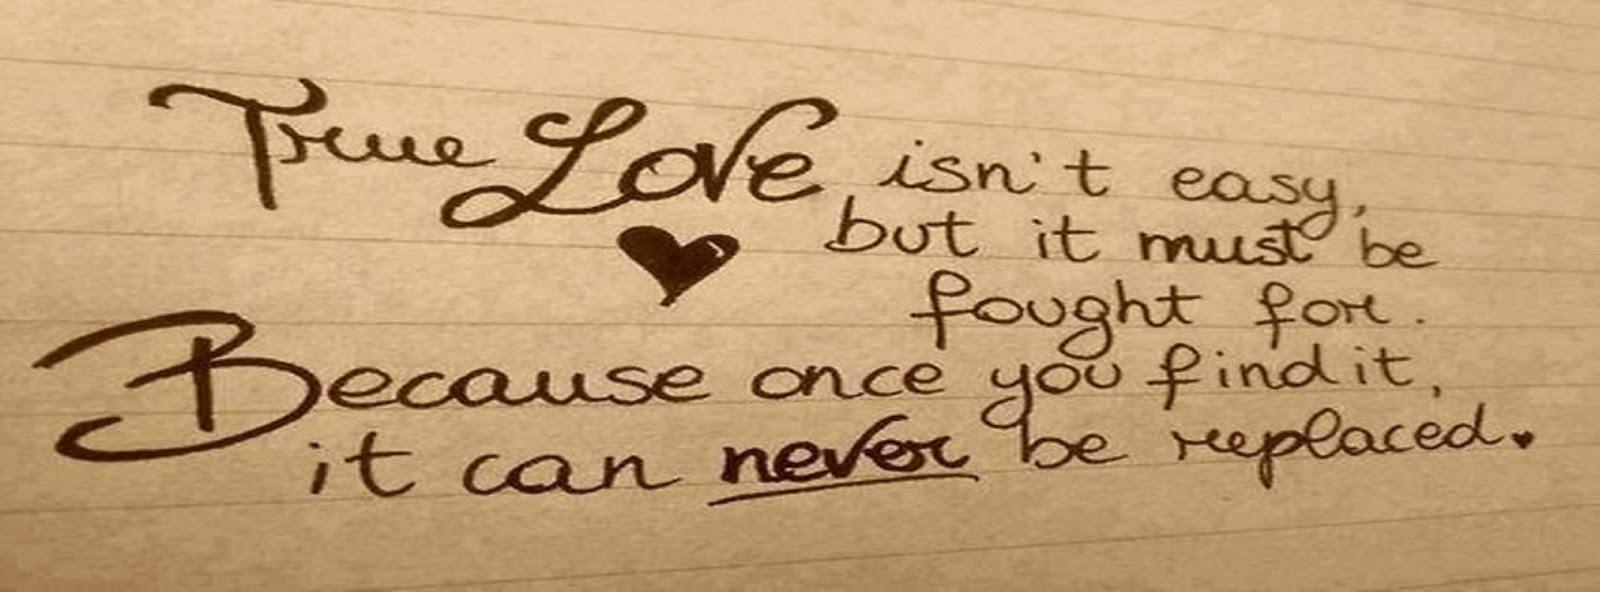 Facebook Cover Photos With Quotes Smileys Wallpaper Love Quotes For Facebook Cover Hd Wallpaper